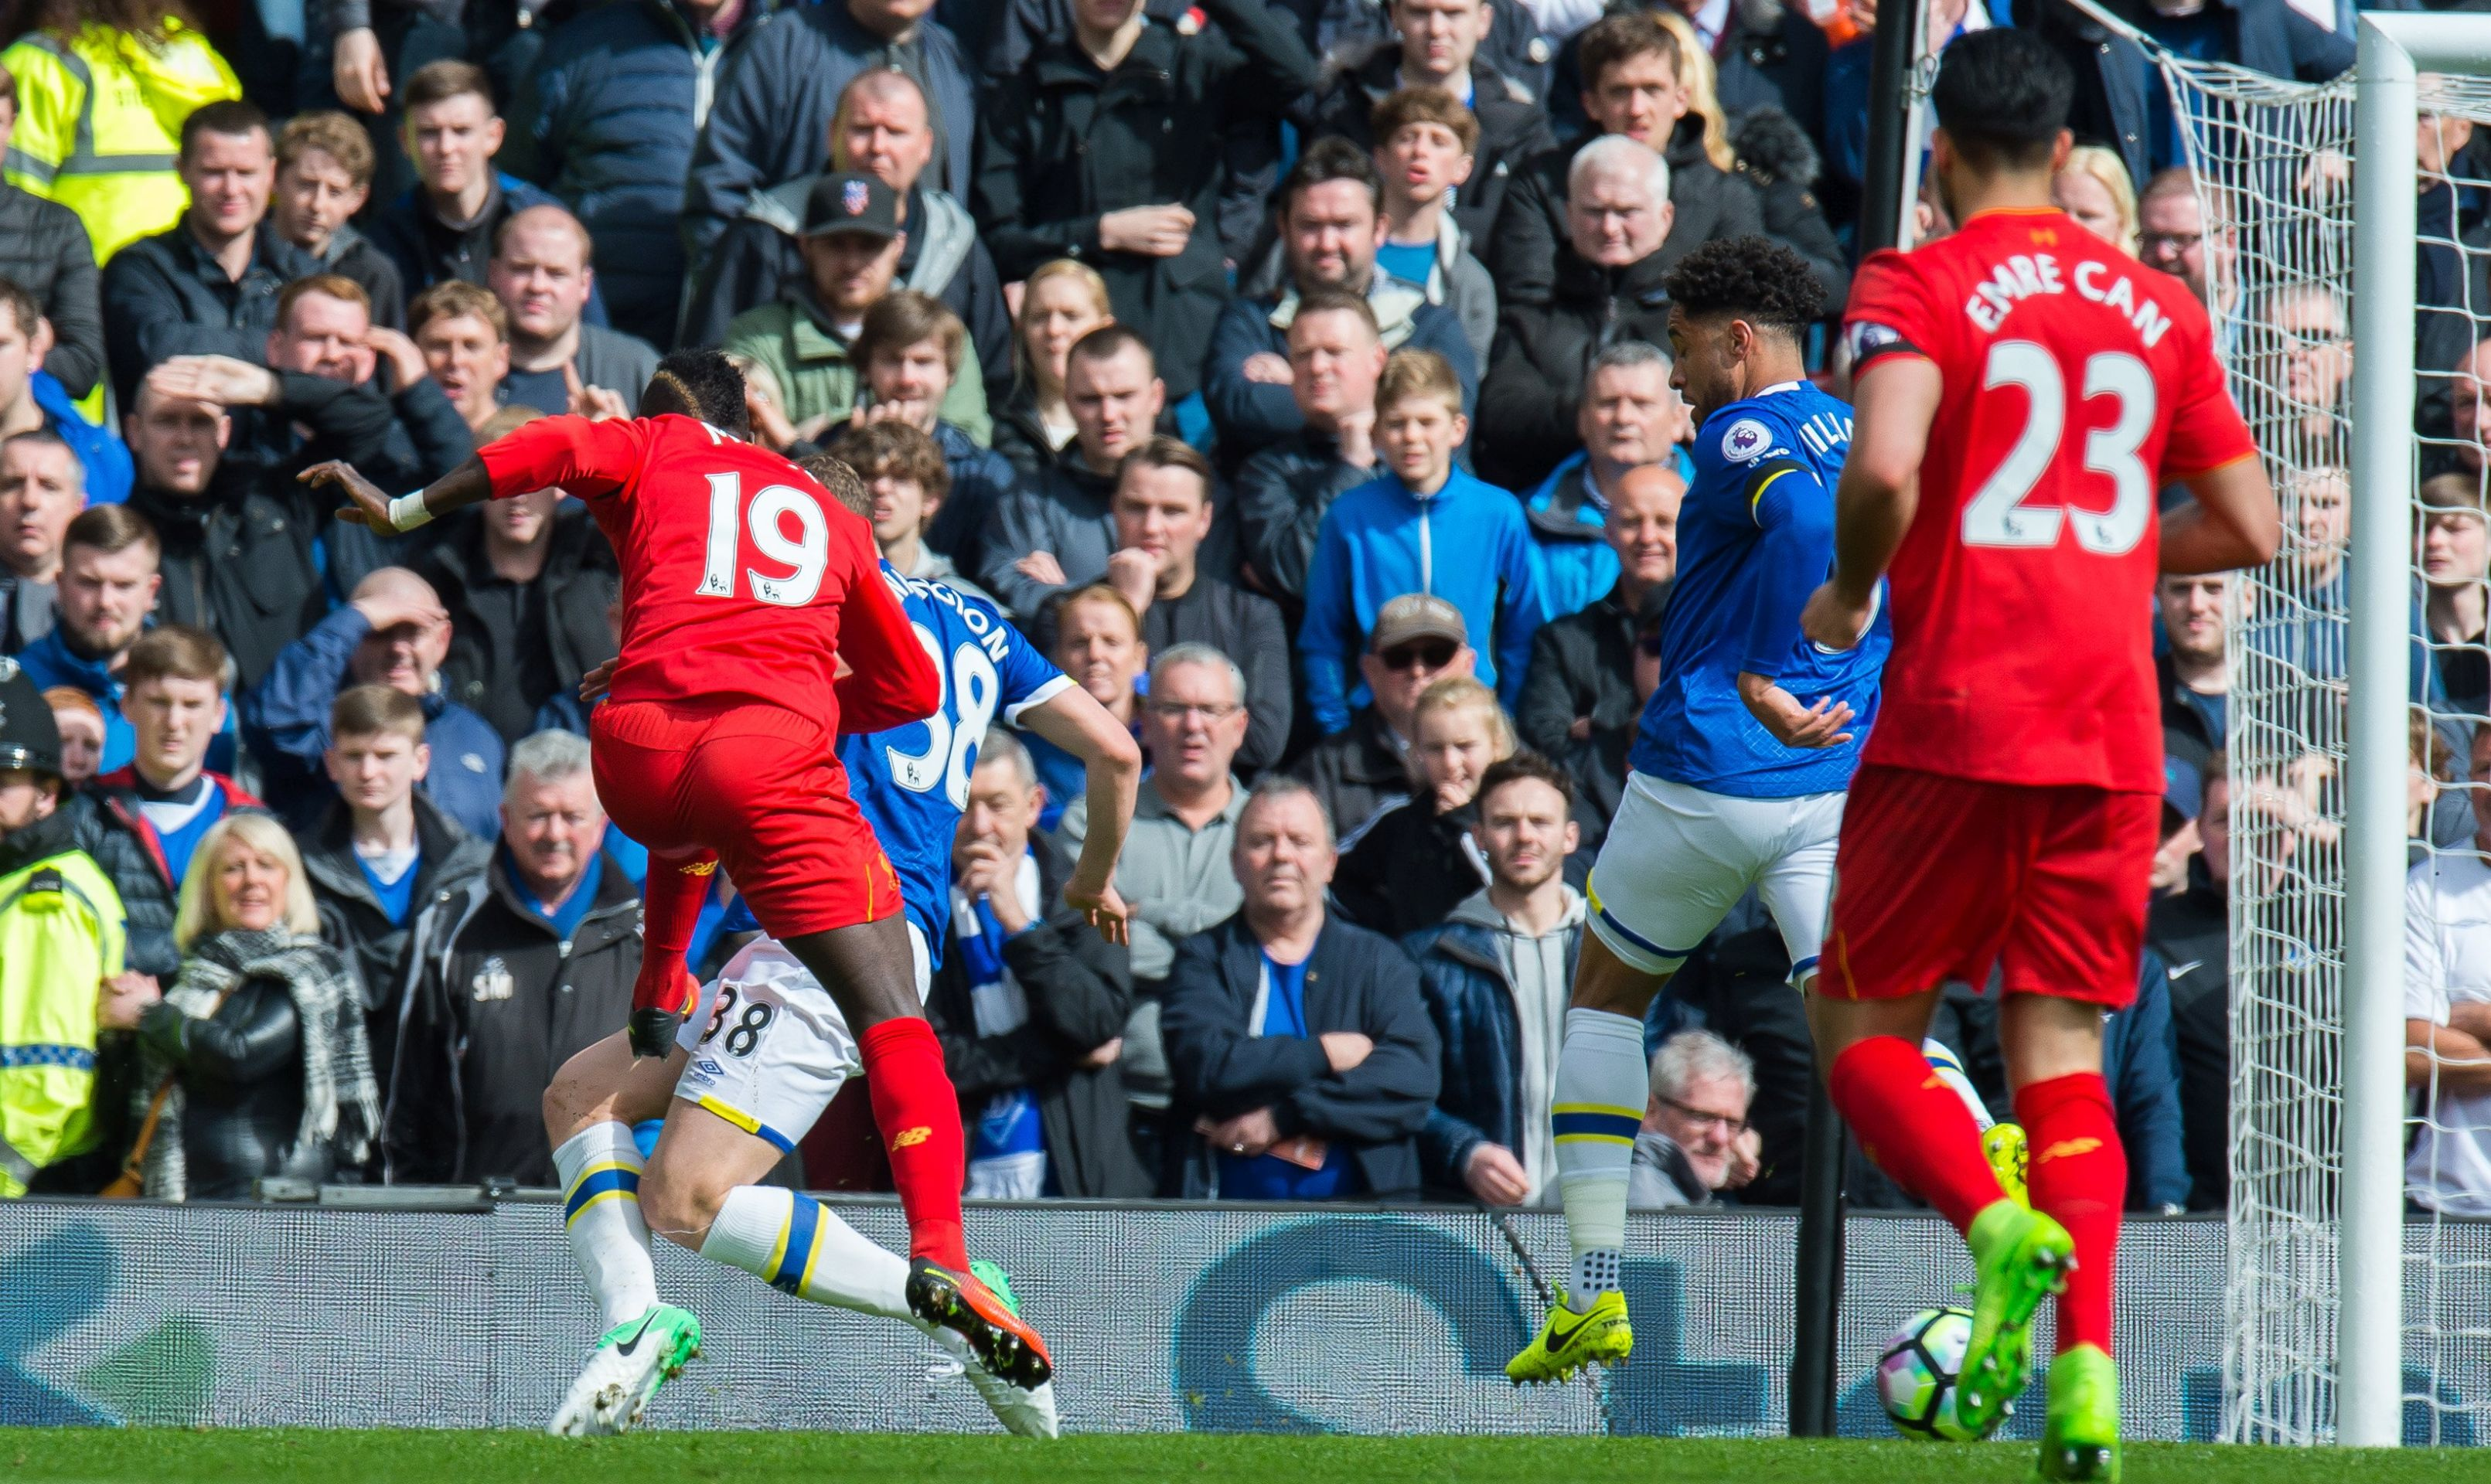 ENGLESKA Liverpool – Everton 3-1, Lovren vrlo dobar